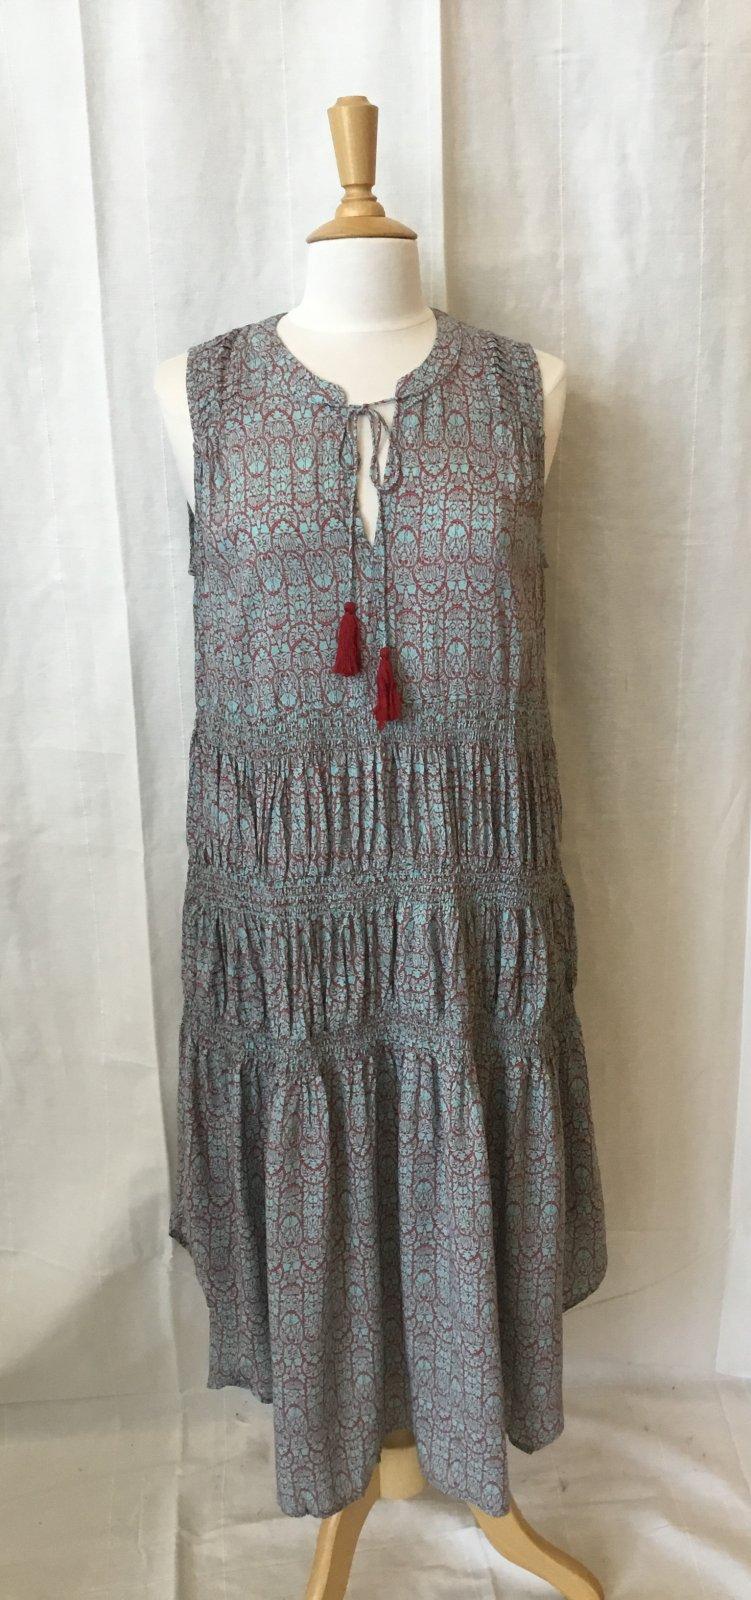 Mystree Smocked Dress W/Tassel